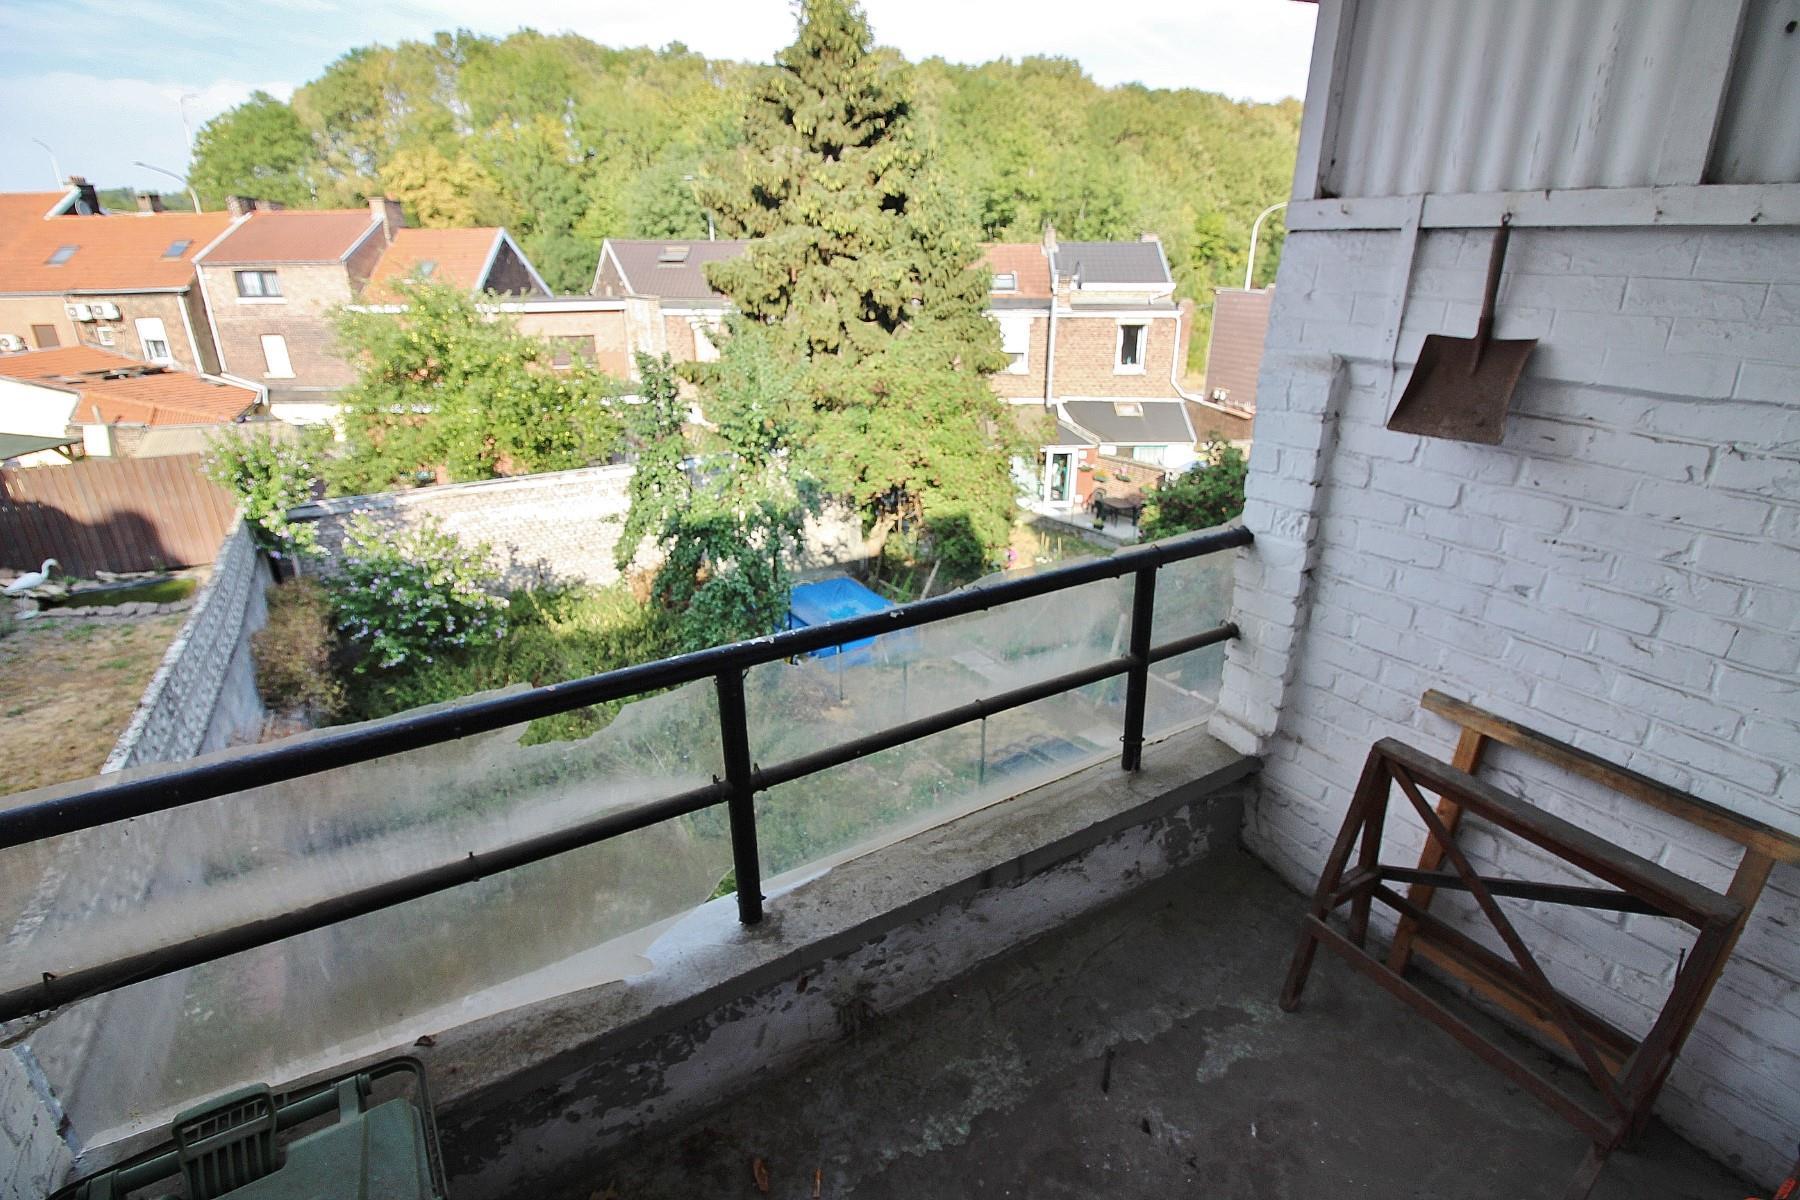 Maison - Seraing Jemeppesur-Meuse - #3539725-6